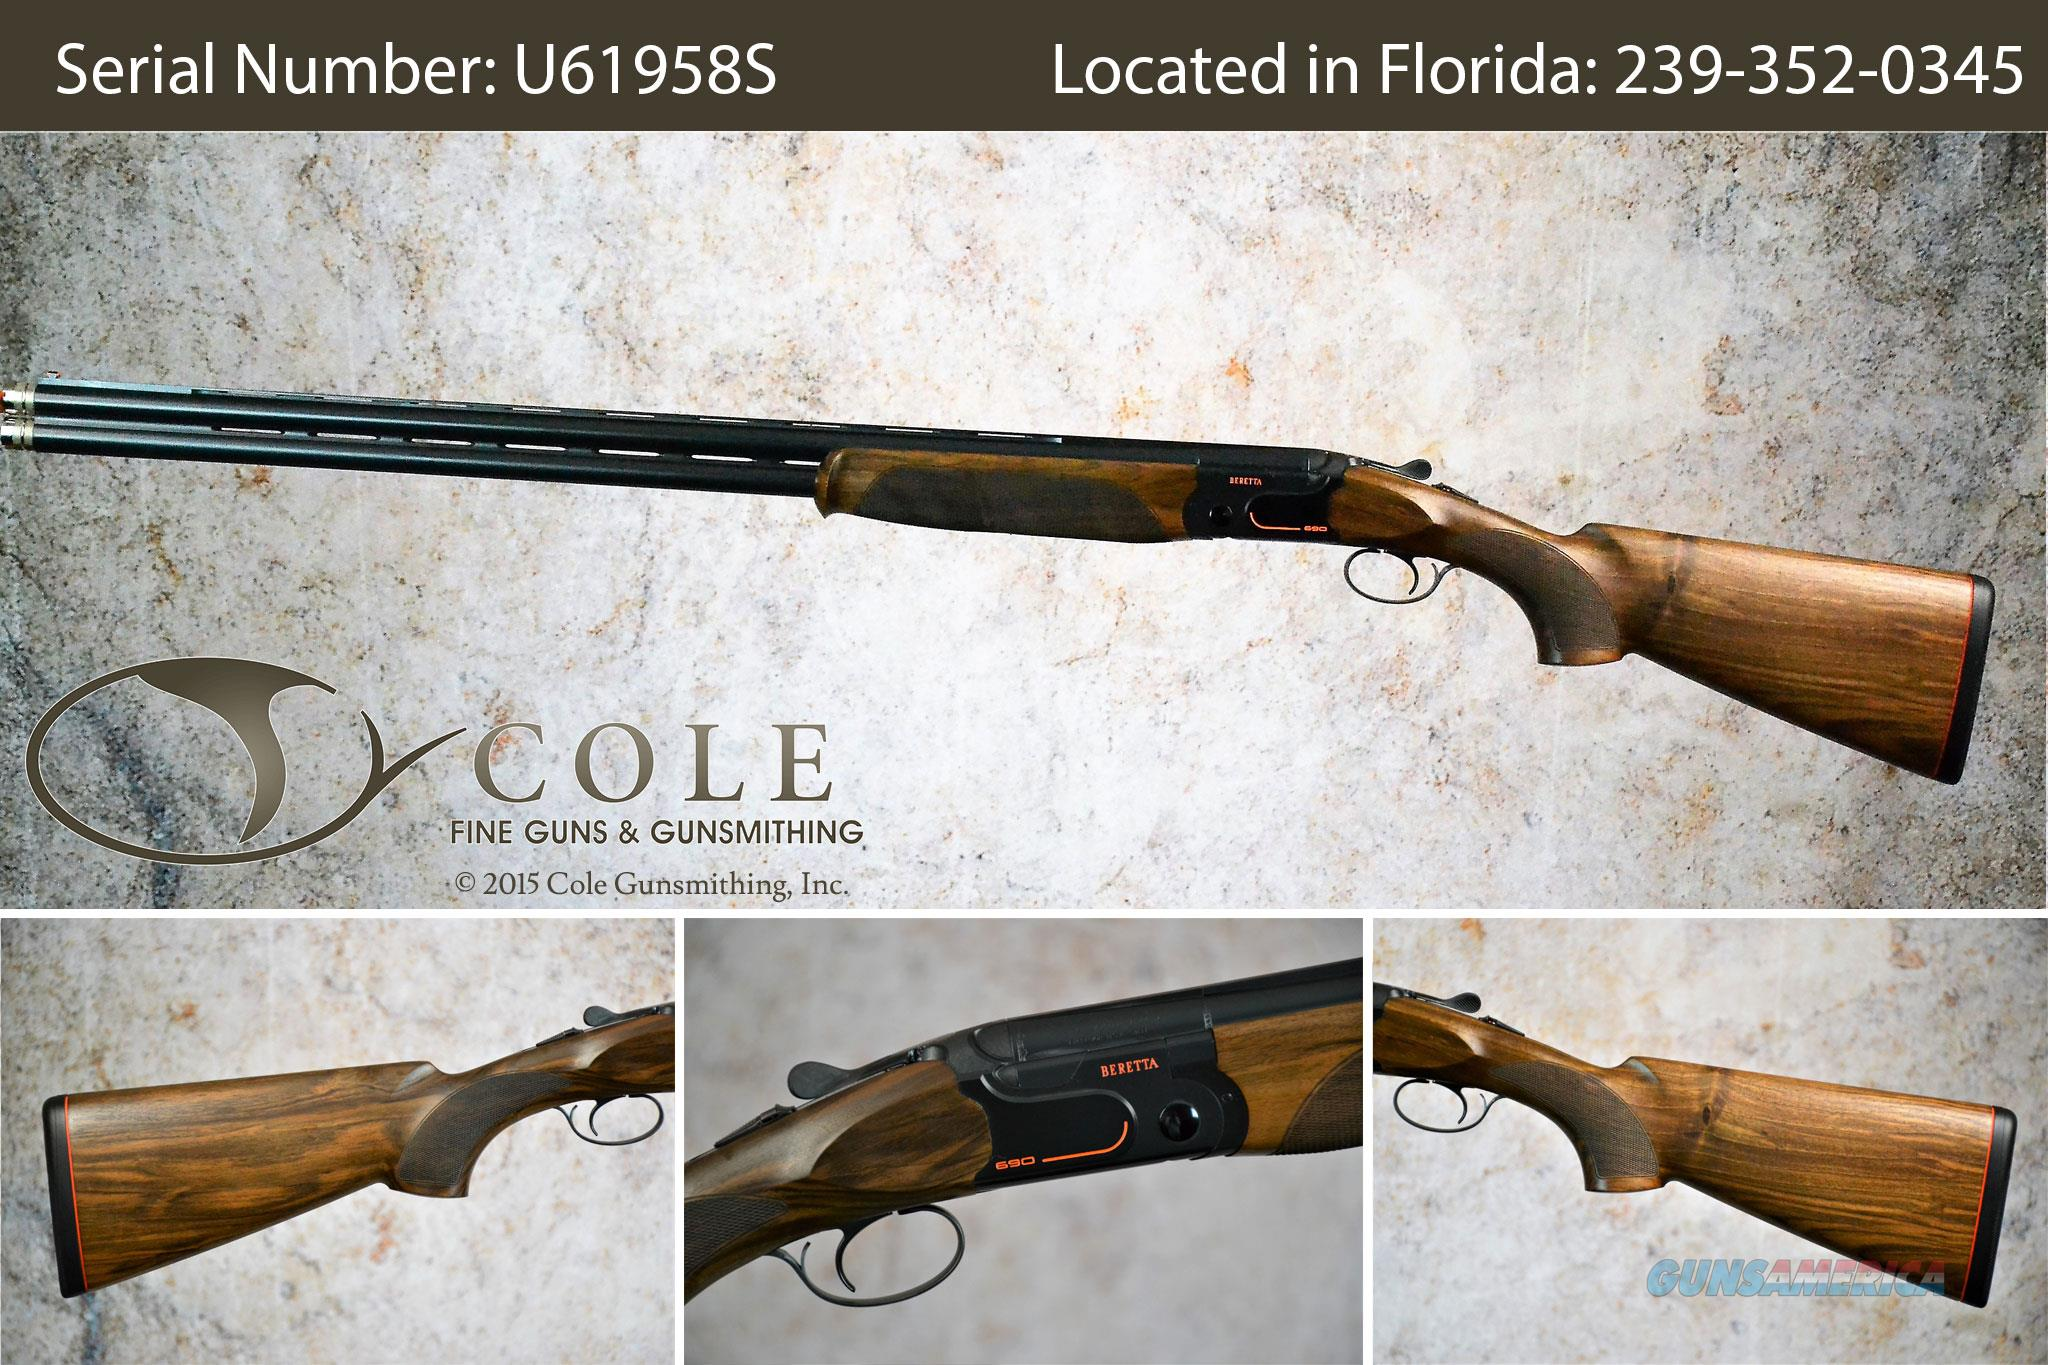 "Beretta 690 Sporting 12g 32"" SN:#U61958S  Guns > Shotguns > Beretta Shotguns > O/U > Trap/Skeet"